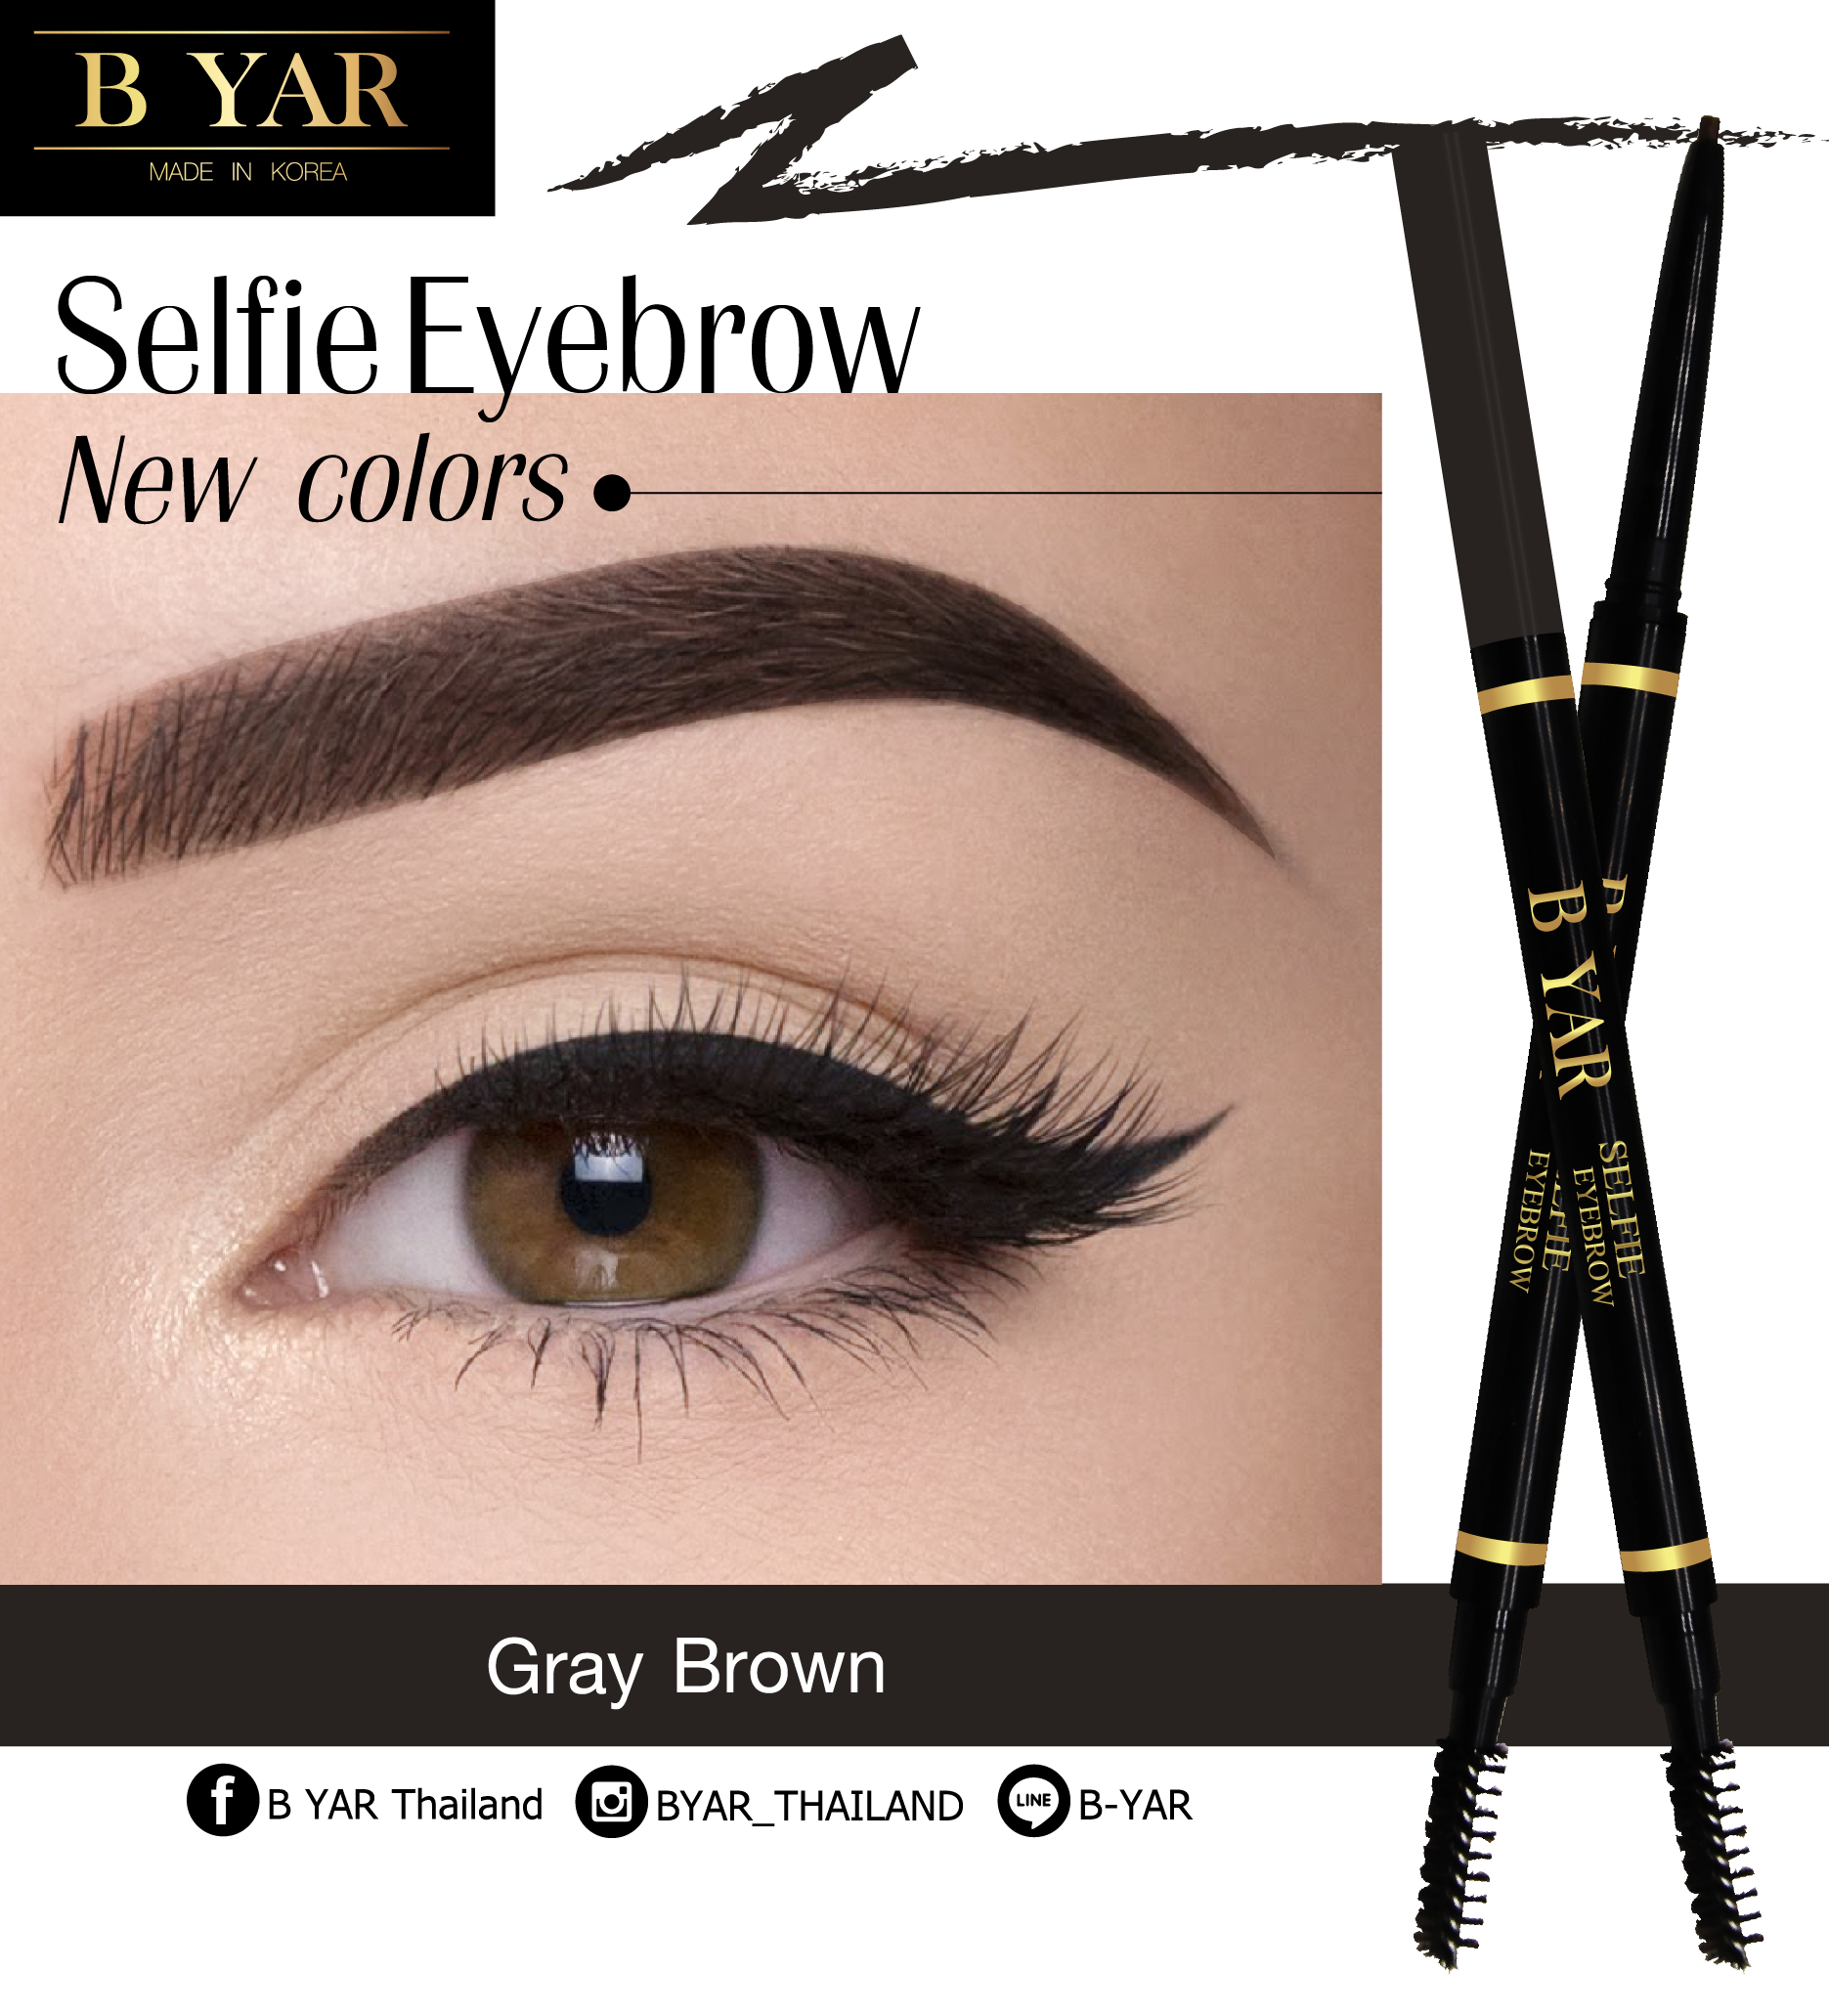 B YAR Selfie Eyebrow #Gray Brown